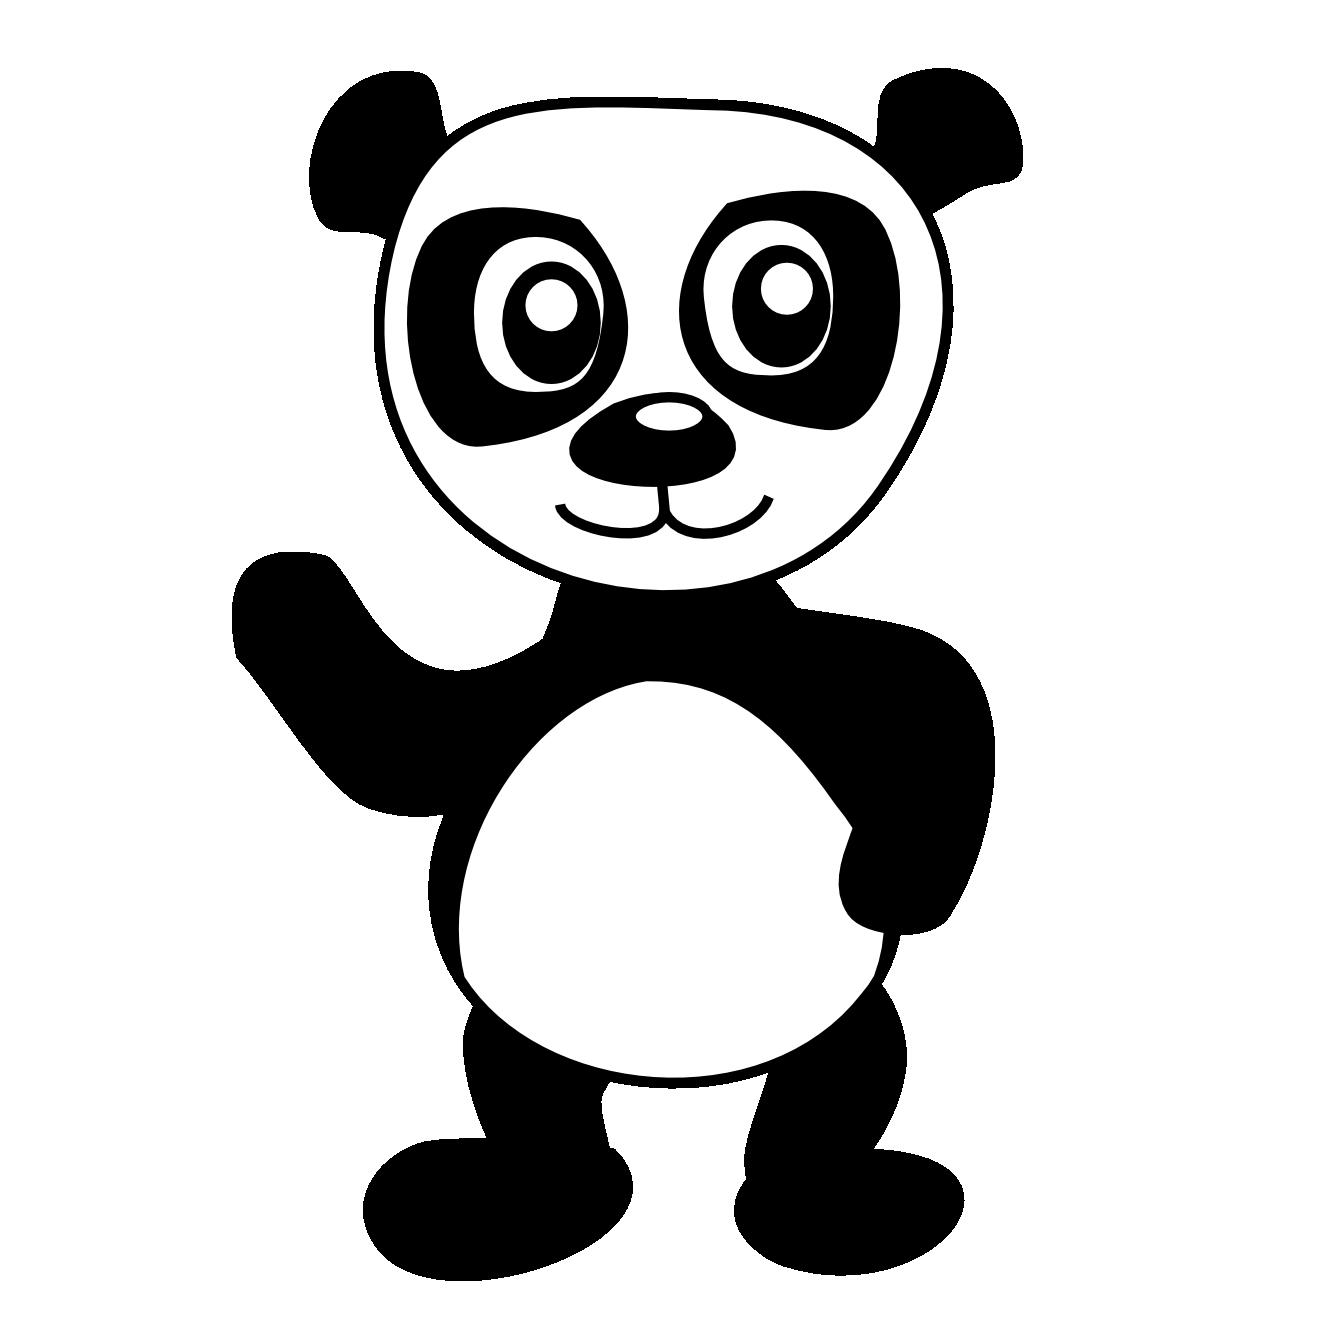 Brilliant Cartoon Panda Bear Coloring Pages With Panda Bear